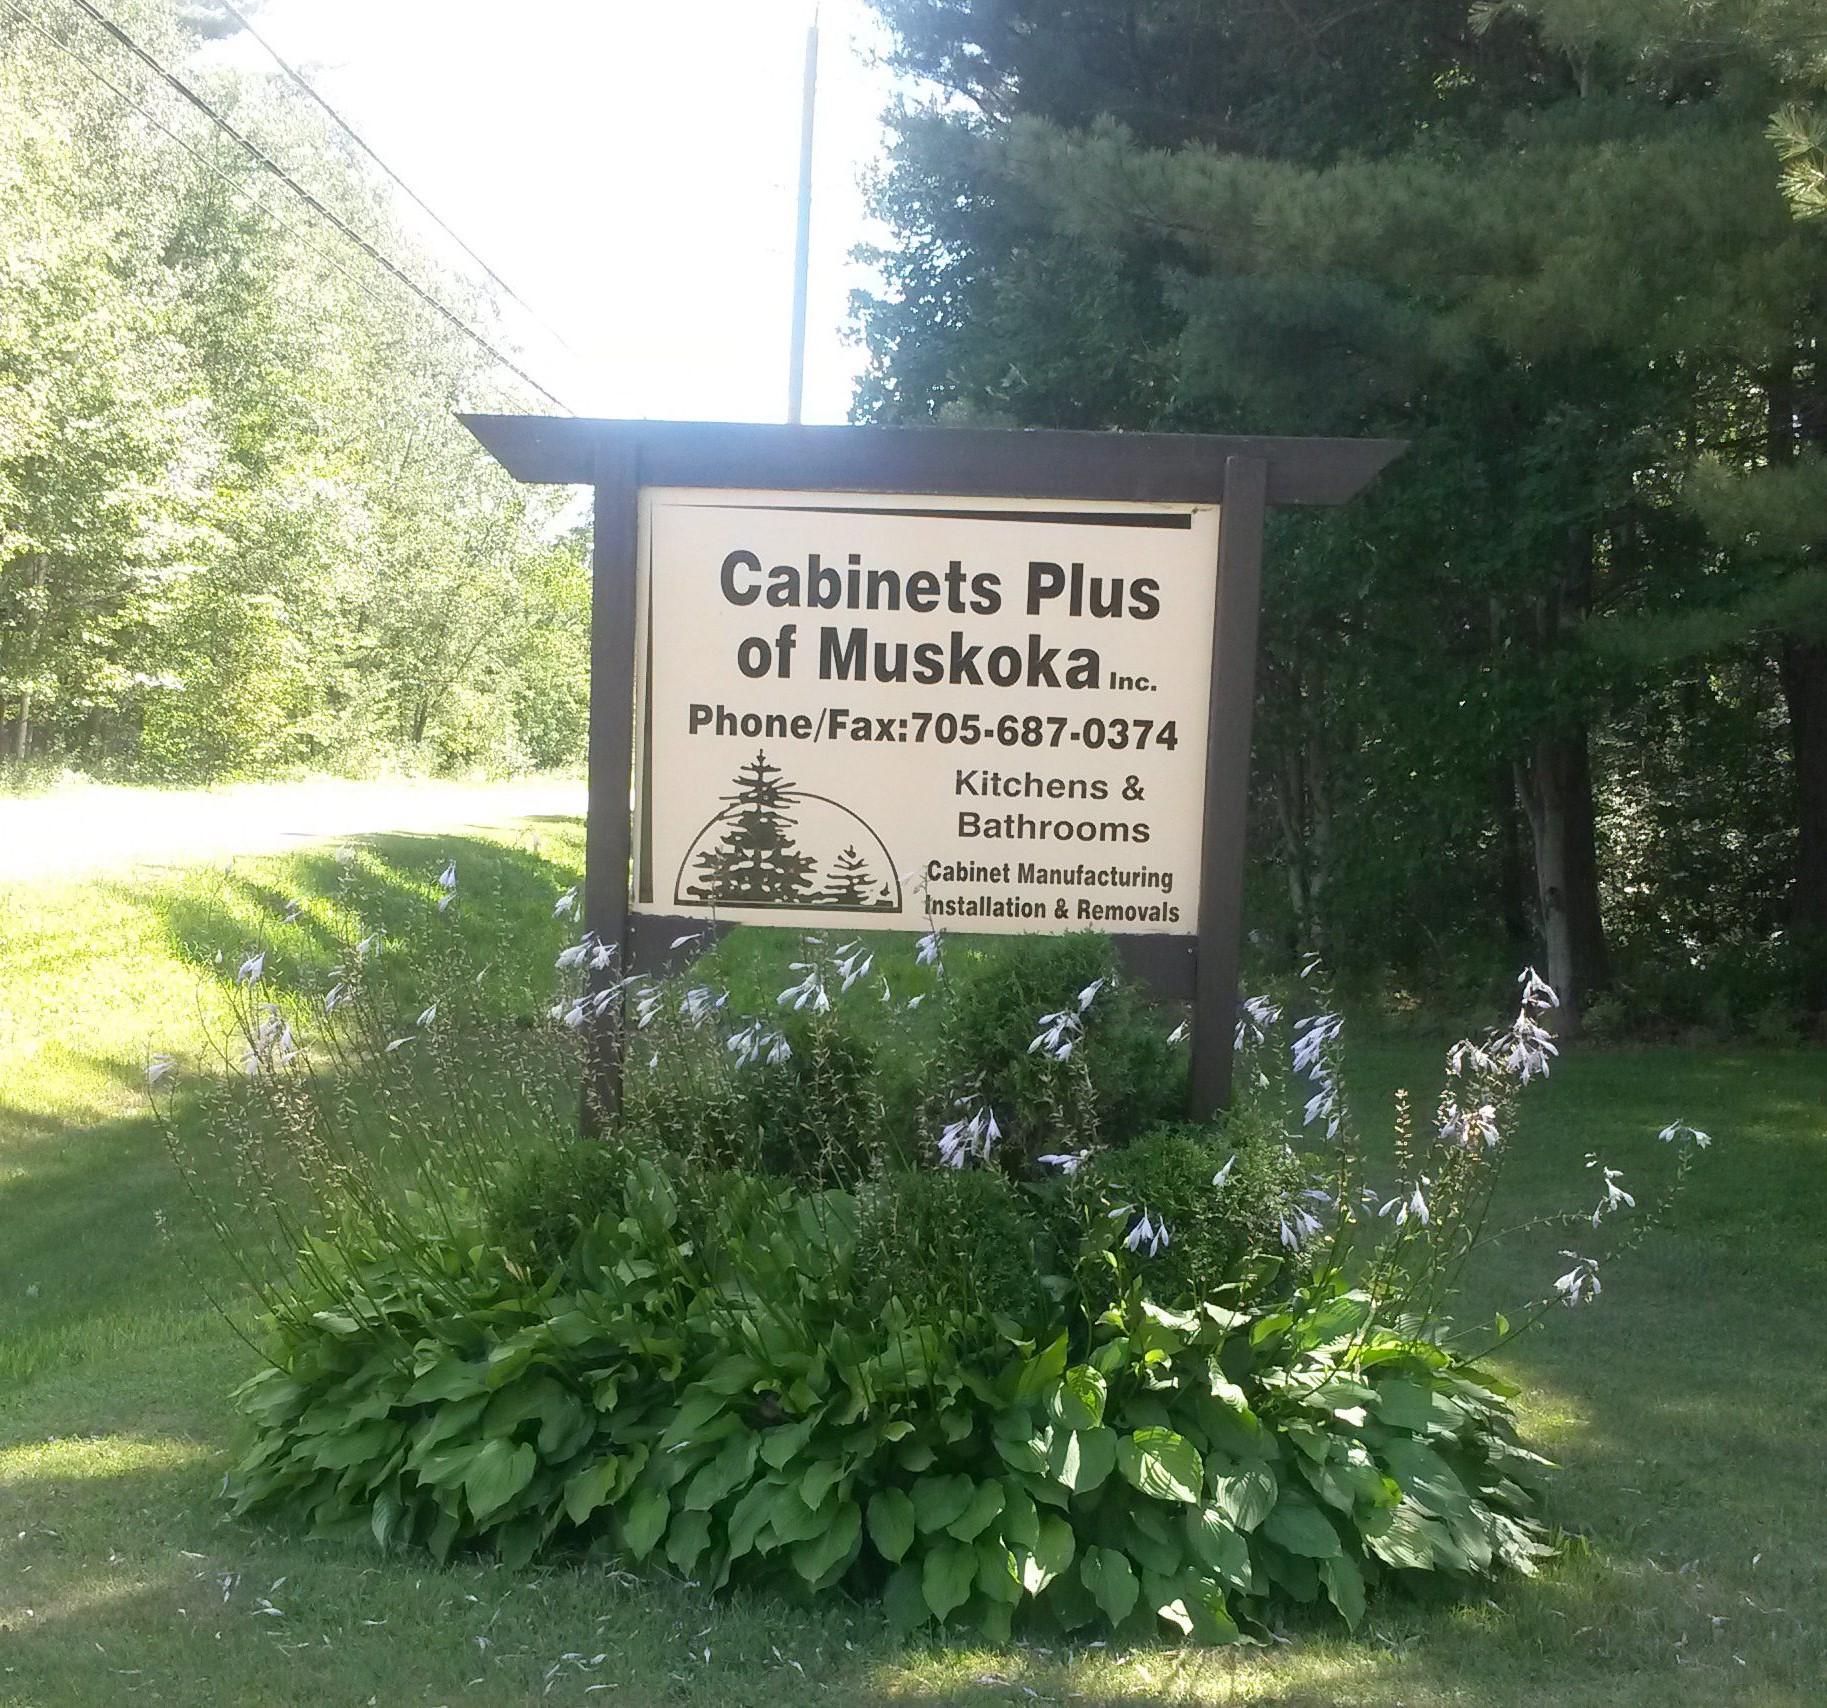 Cabinets Plus of Muskoka sign